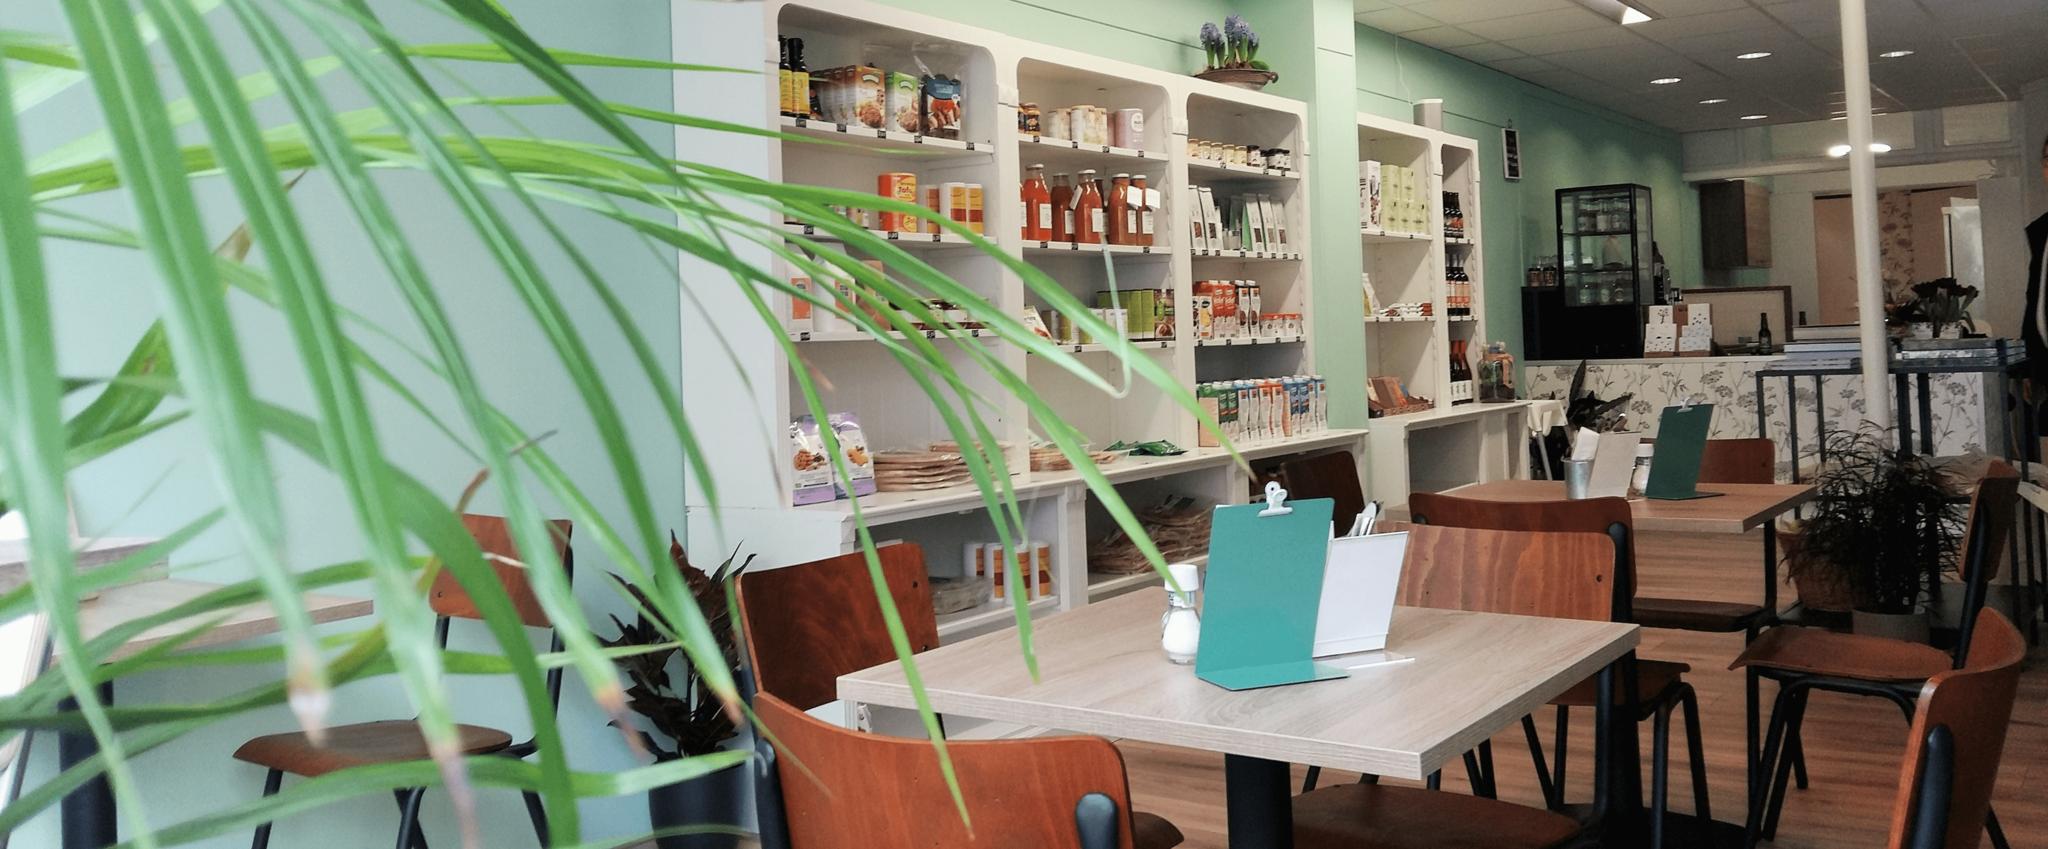 Vegan lunchroom vegan winkel Gouda Your Foodprint